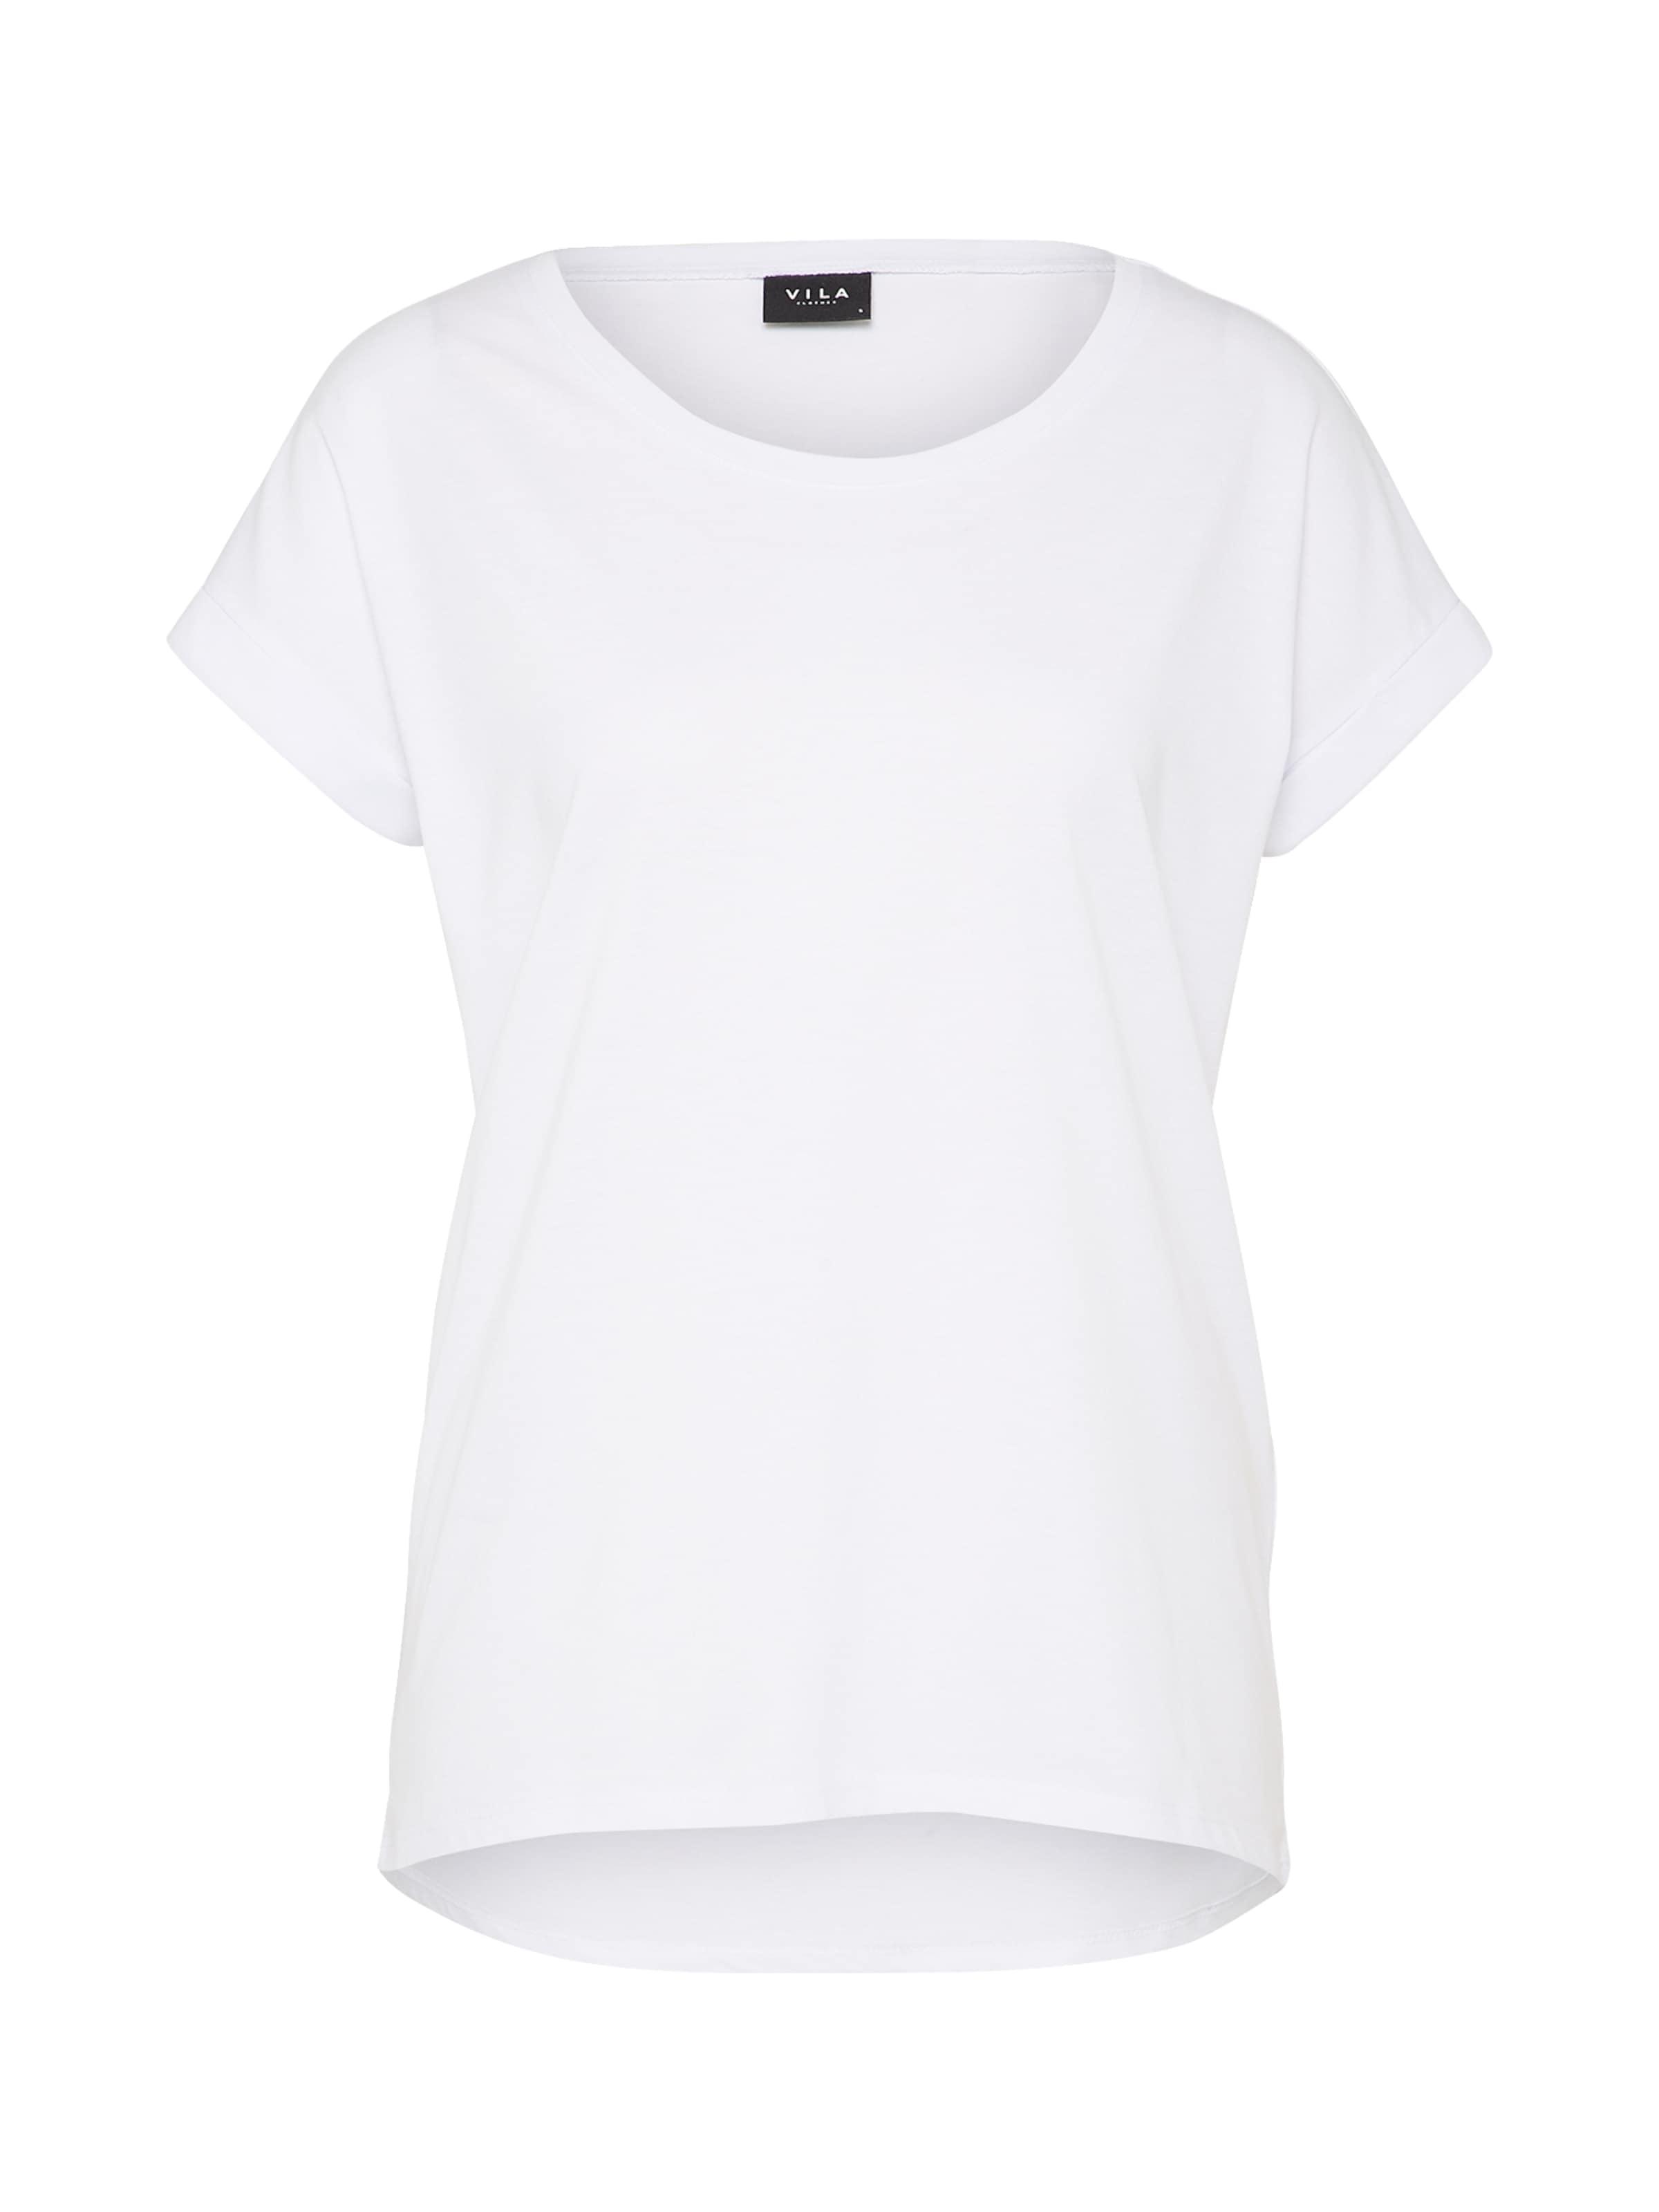 Shirt Vila Wit Wit In 'dreamers' Shirt 'dreamers' Vila In Vila Shirt 'dreamers' wOkuiTPXZ